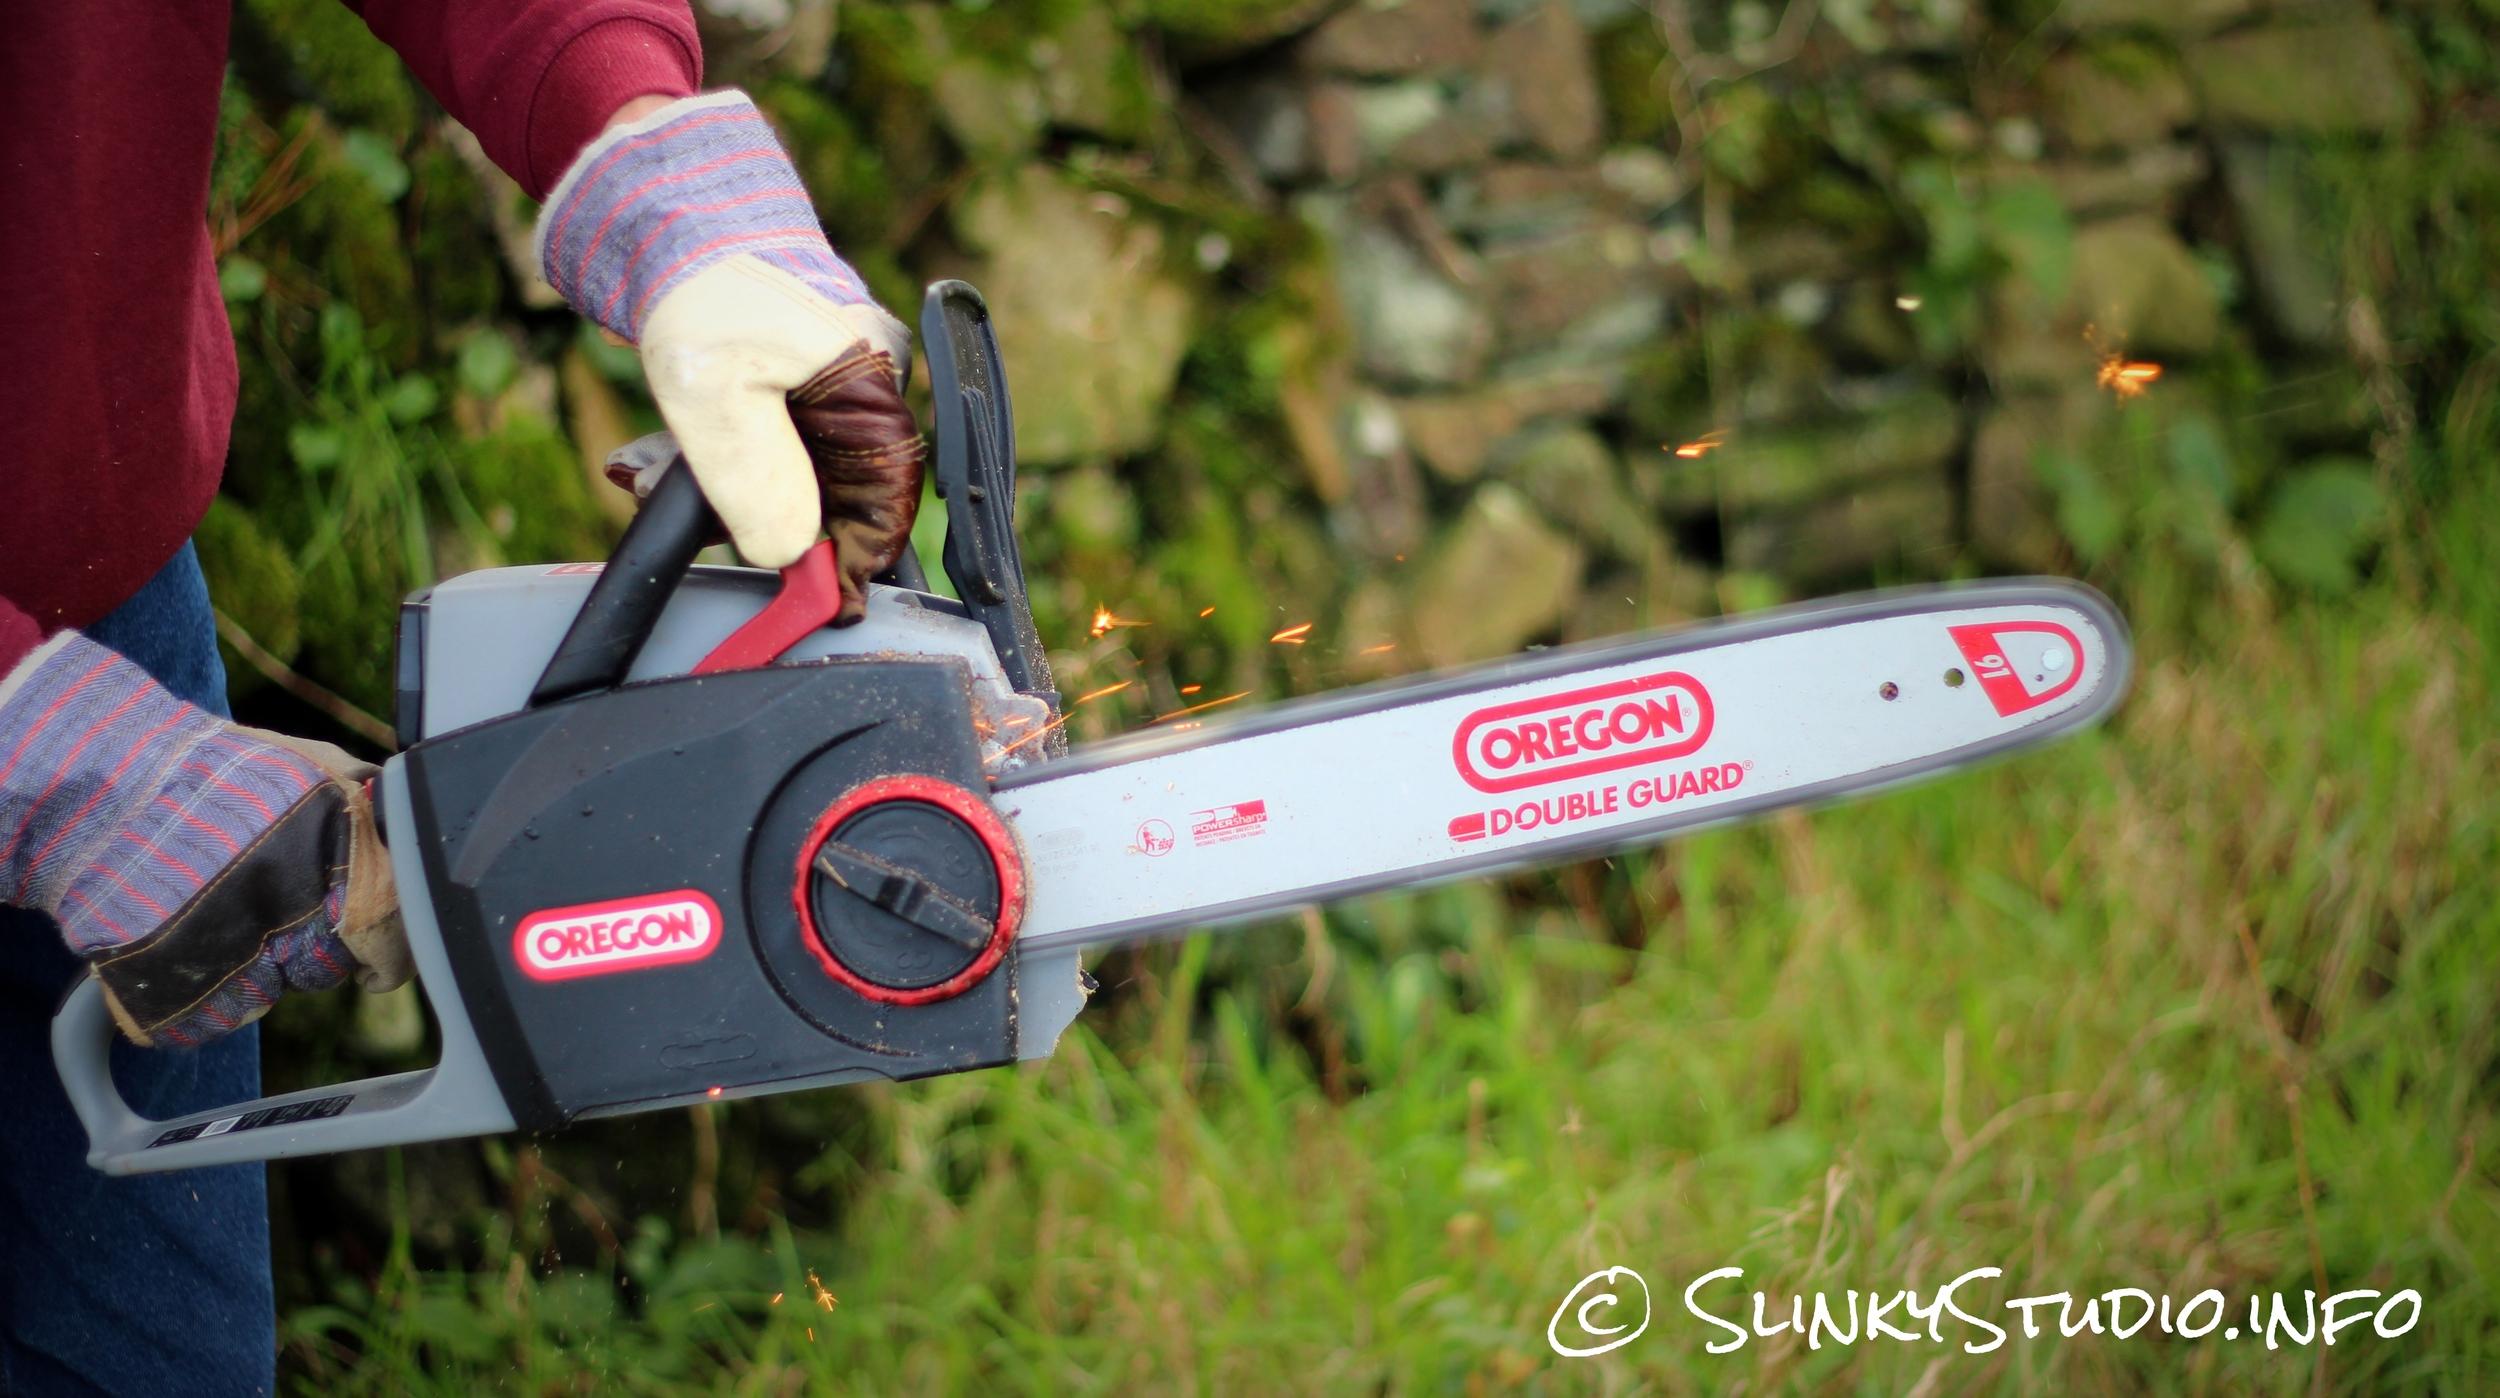 Oregon CS300 PowerNow Cordless Chainsaw Chain Sharpener